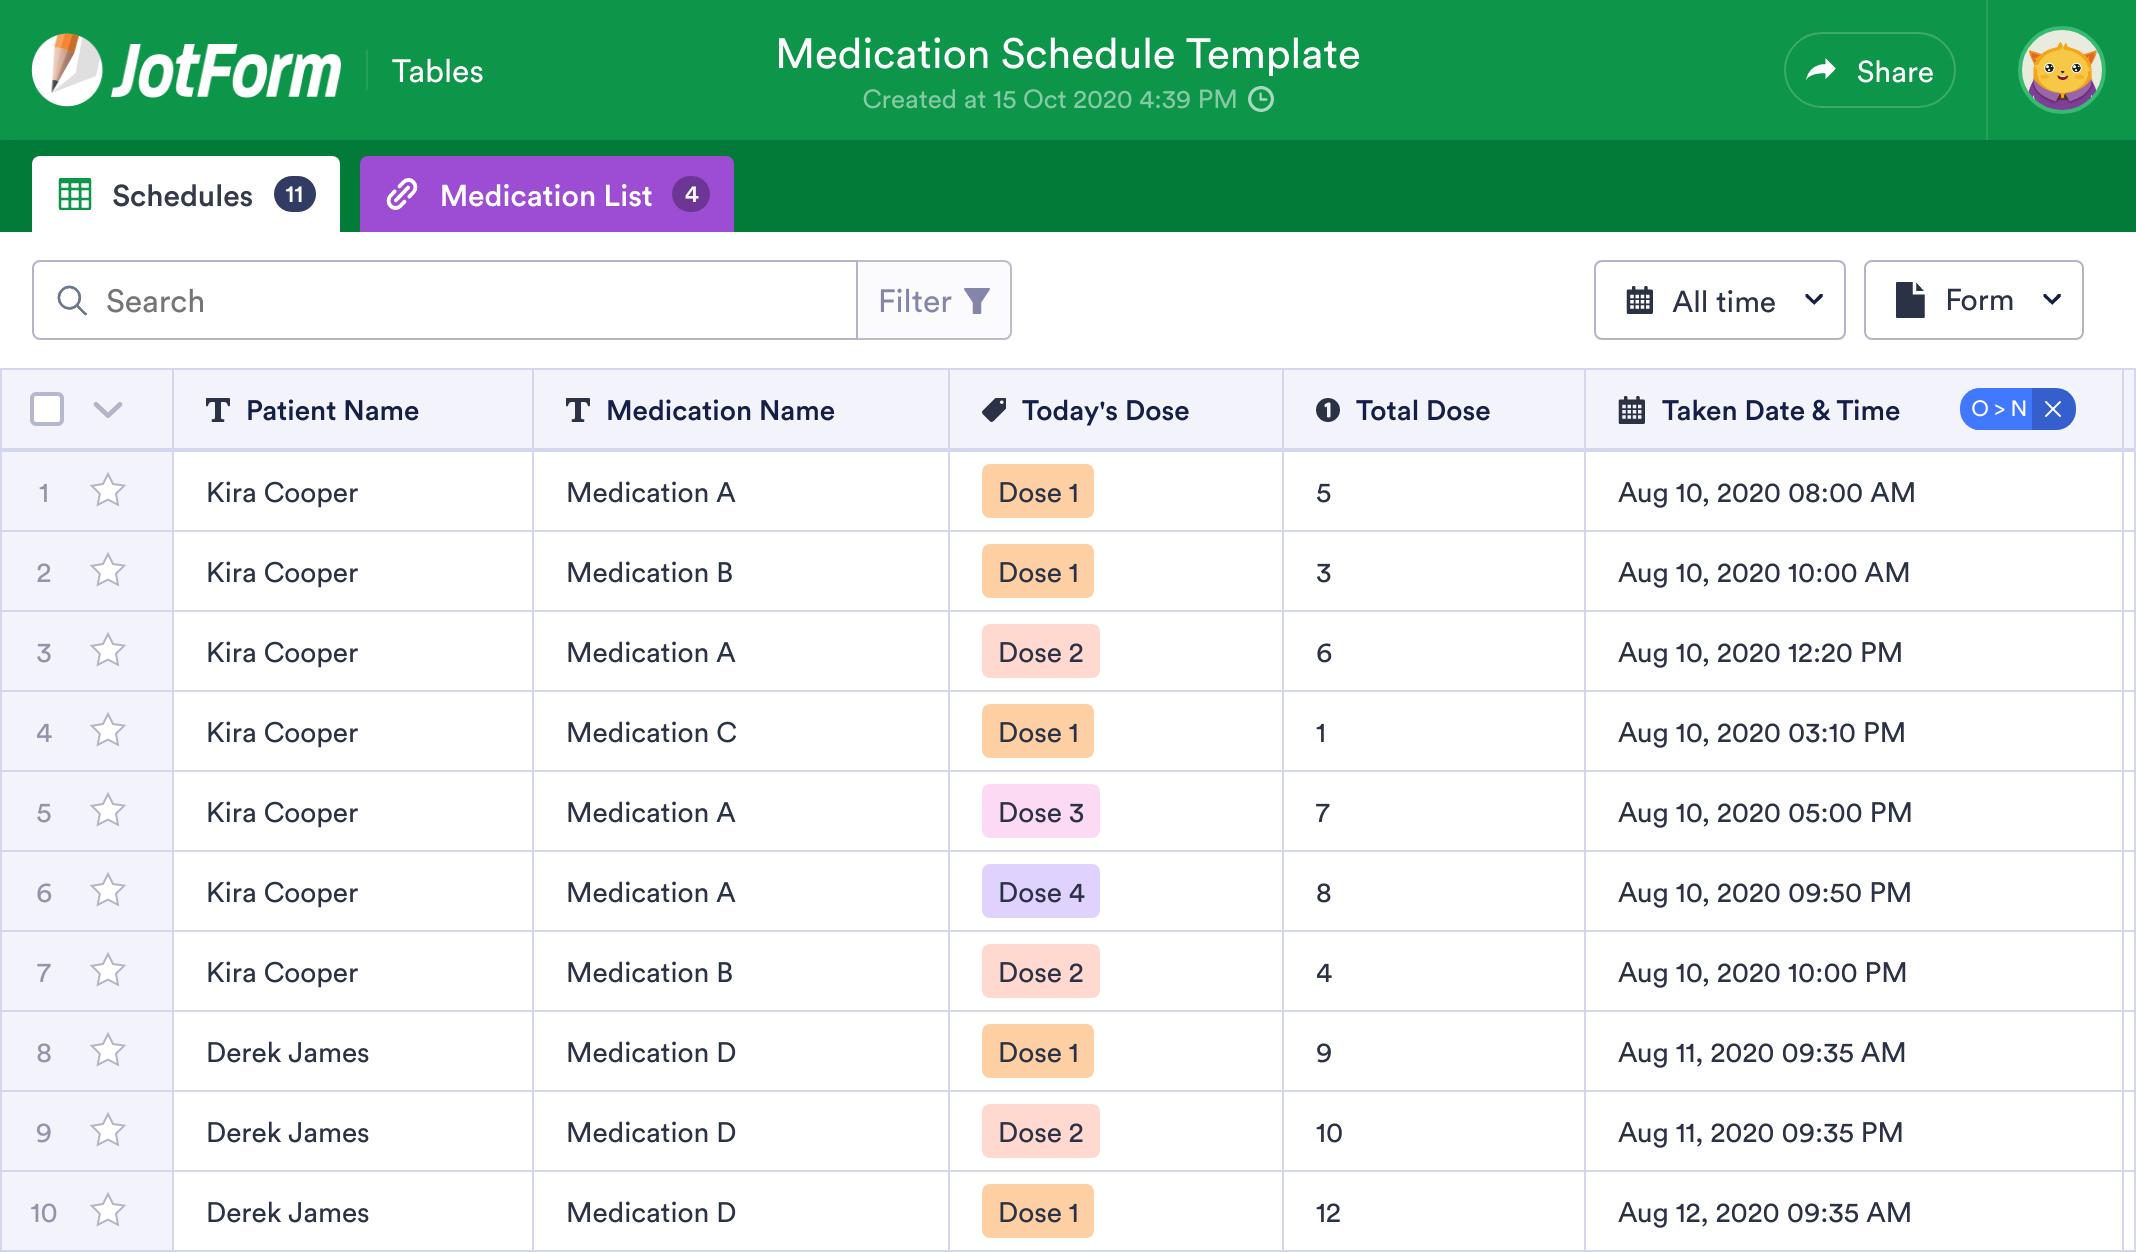 Medication Schedule Template